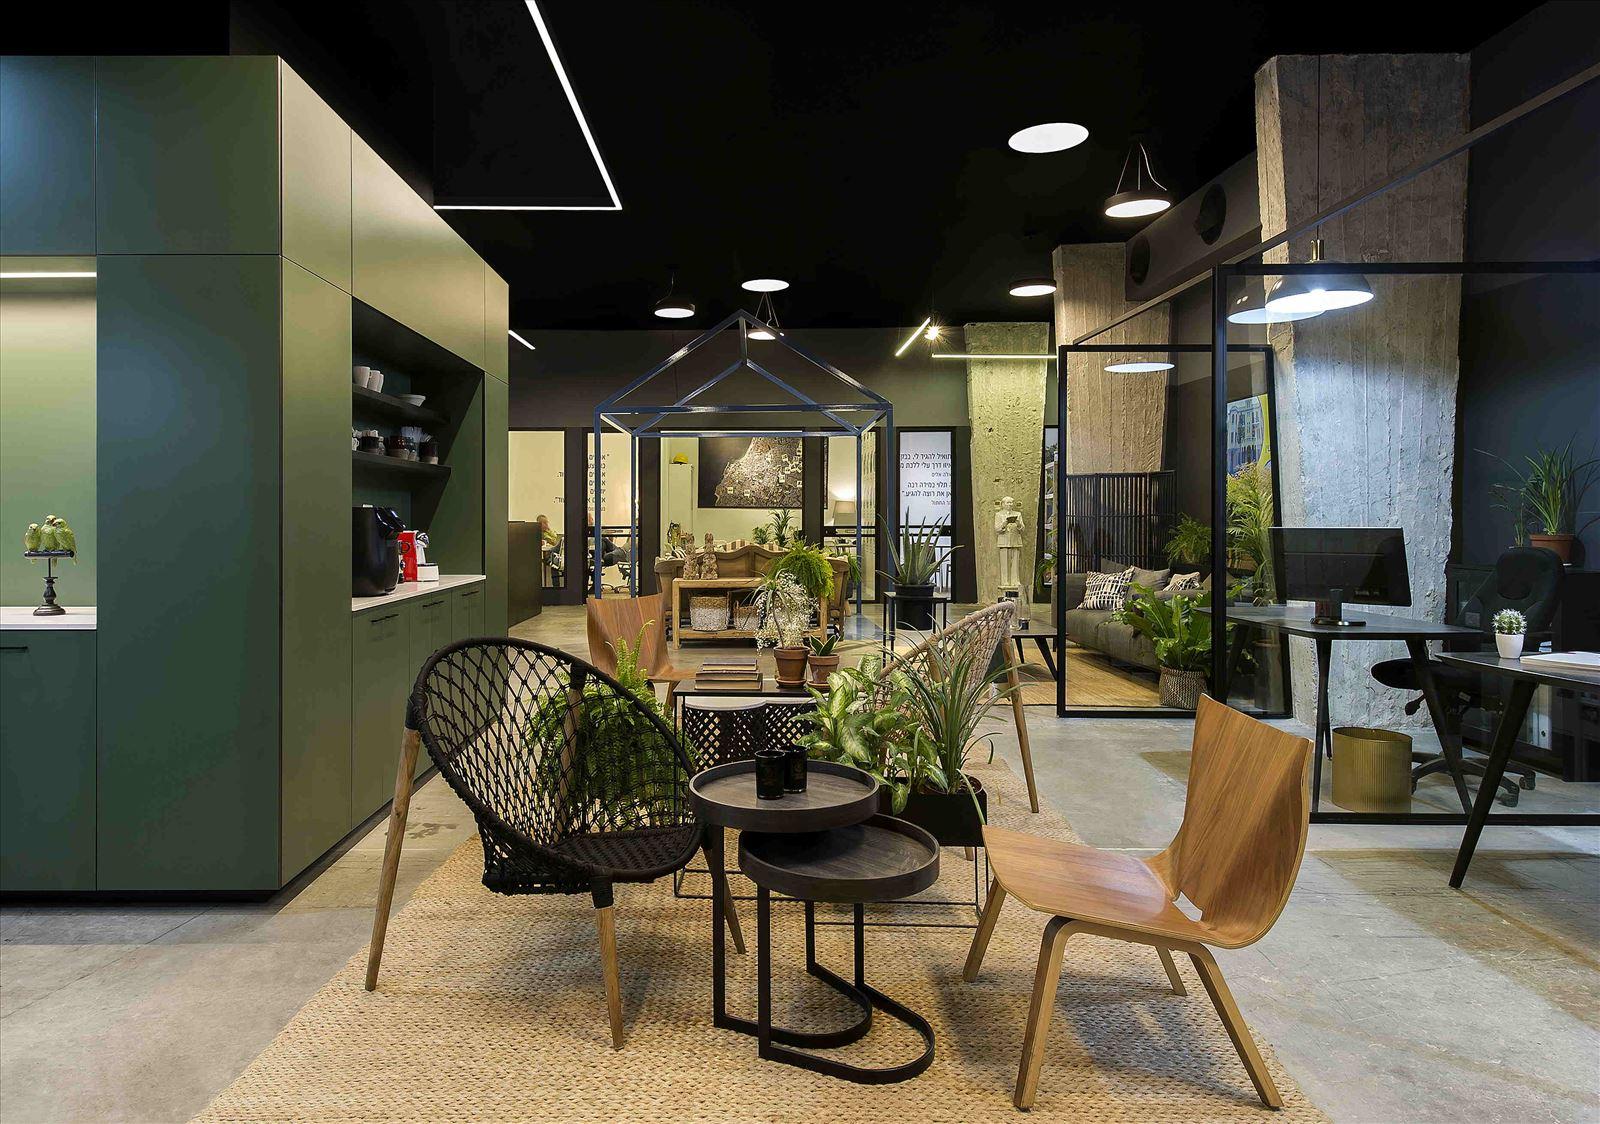 Ewave Offices תאורת משרדים מרהיבה על ידי קמחי תאורה